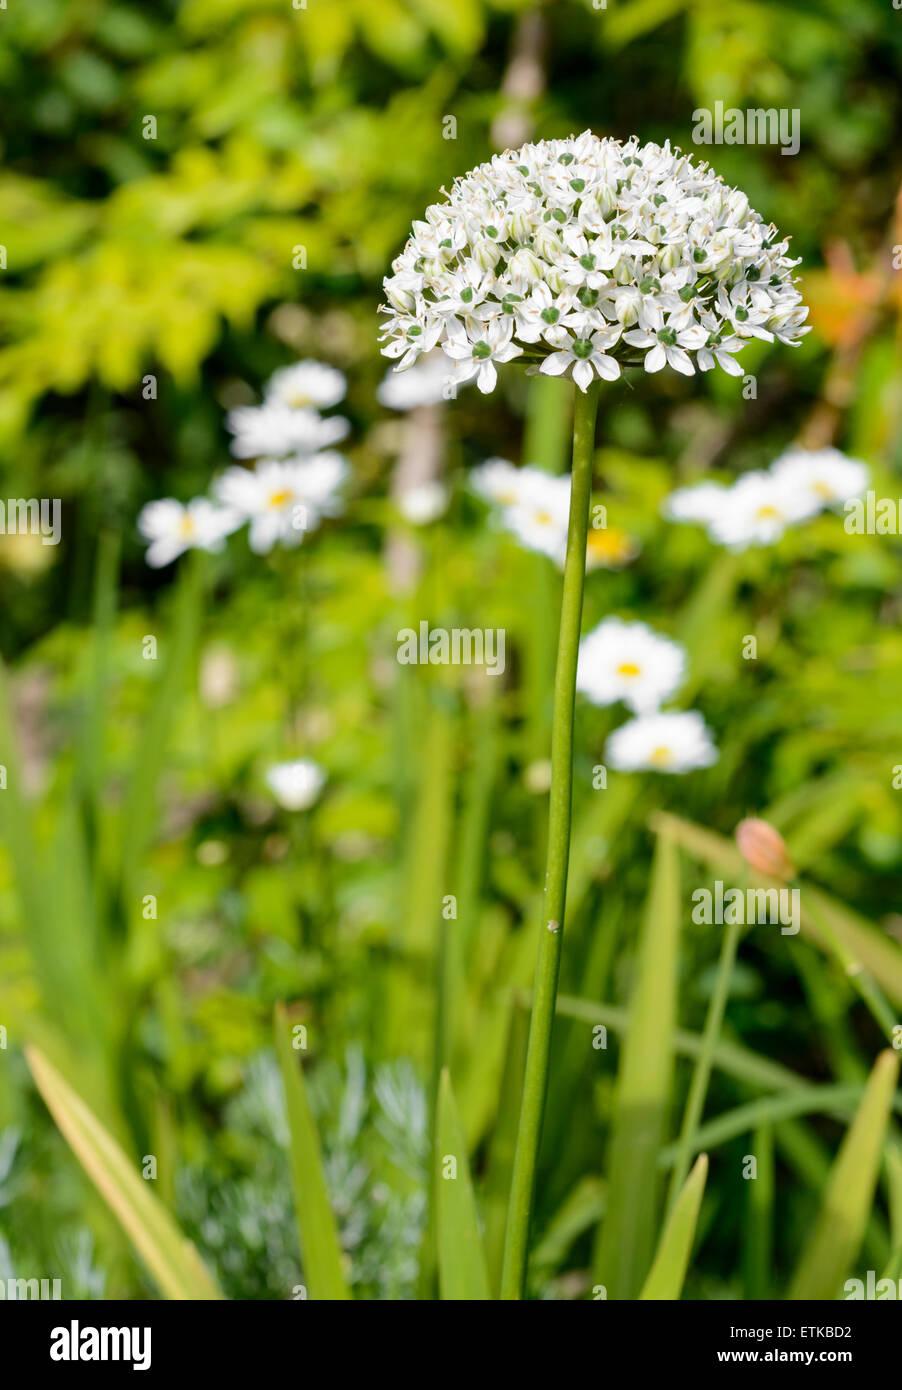 Allium Nigrum (Black Garlic, Broad-leaved Onion) flower in mid June in West Sussex, England, UK. - Stock Image